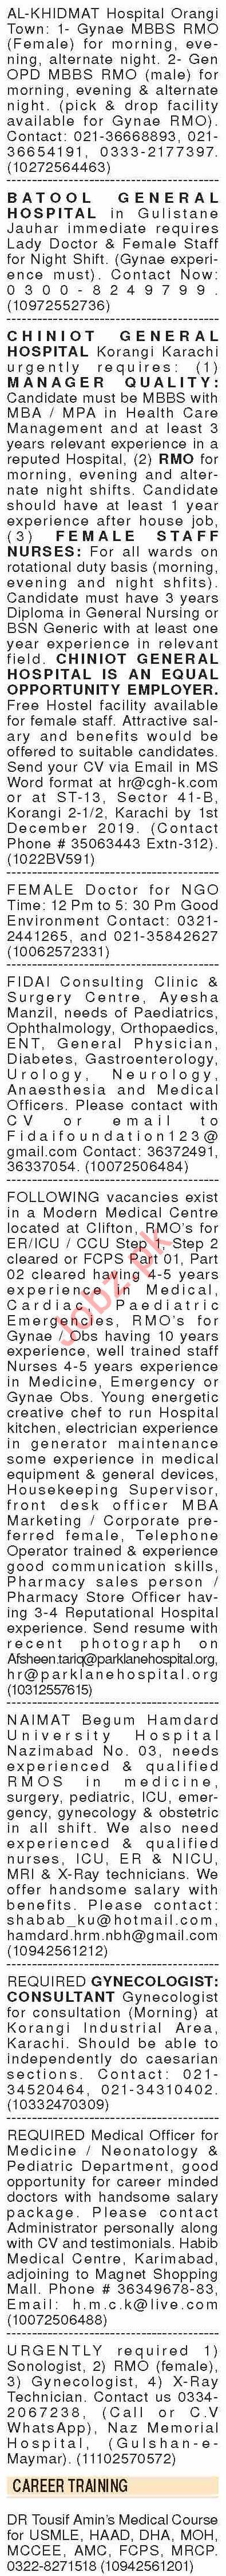 Dawn Sunday Classified Ads 17th Nov 2019 for Medical Staff